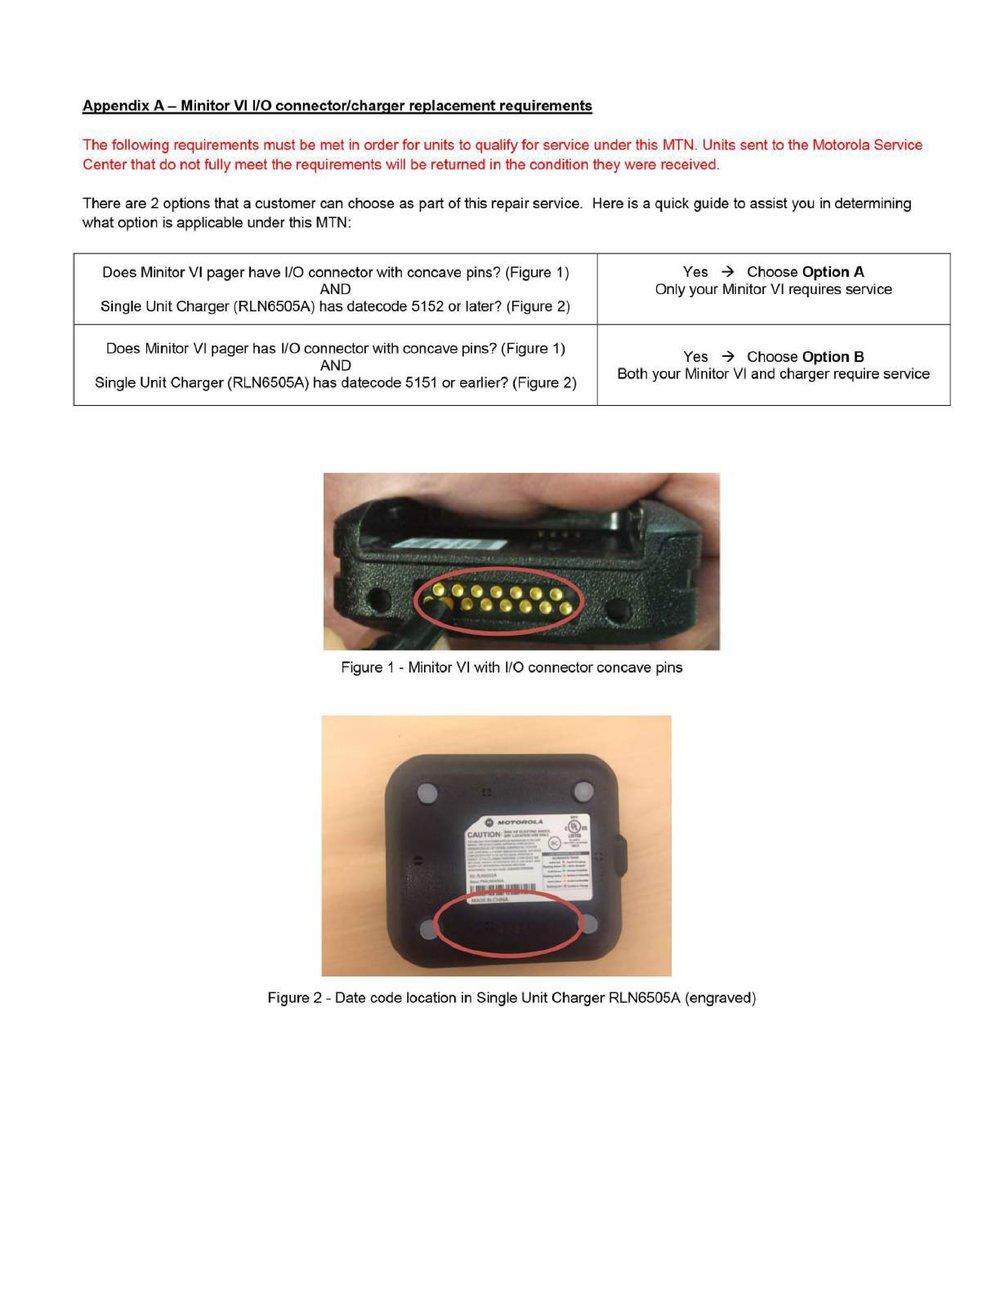 Motorola MTN Instructions_Min_VI Charging_C-page-2.jpg